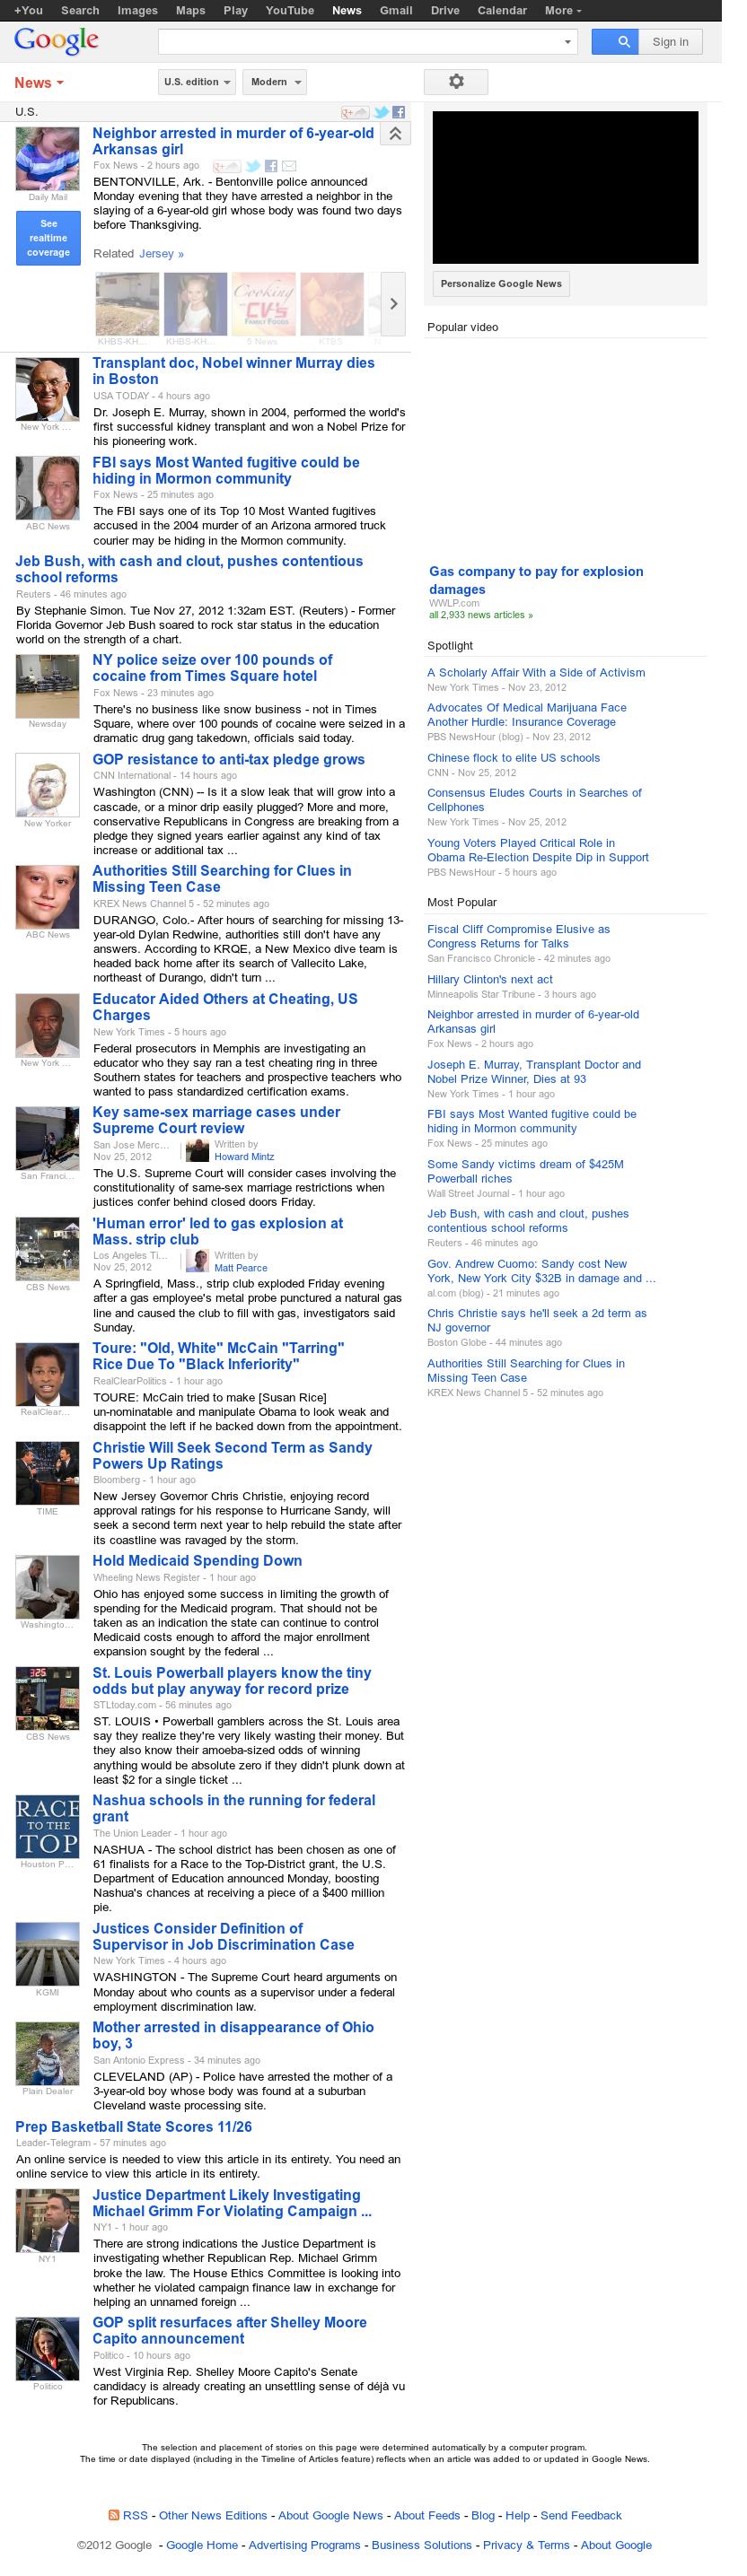 Google News: U.S. at Tuesday Nov. 27, 2012, 7:14 a.m. UTC